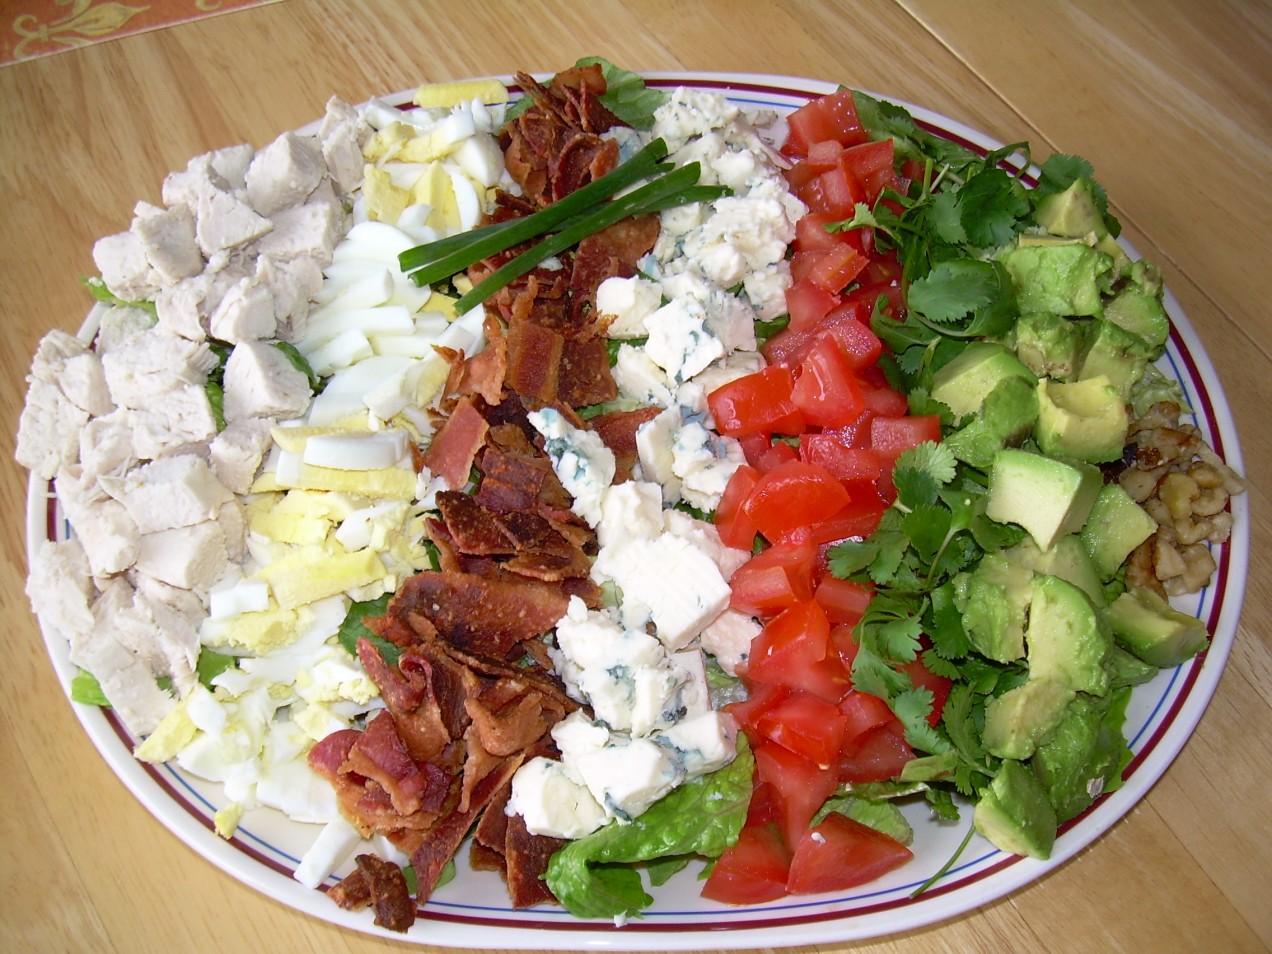 Niederlande Infos Pictures Of Vegetable Salad Decoration Competition